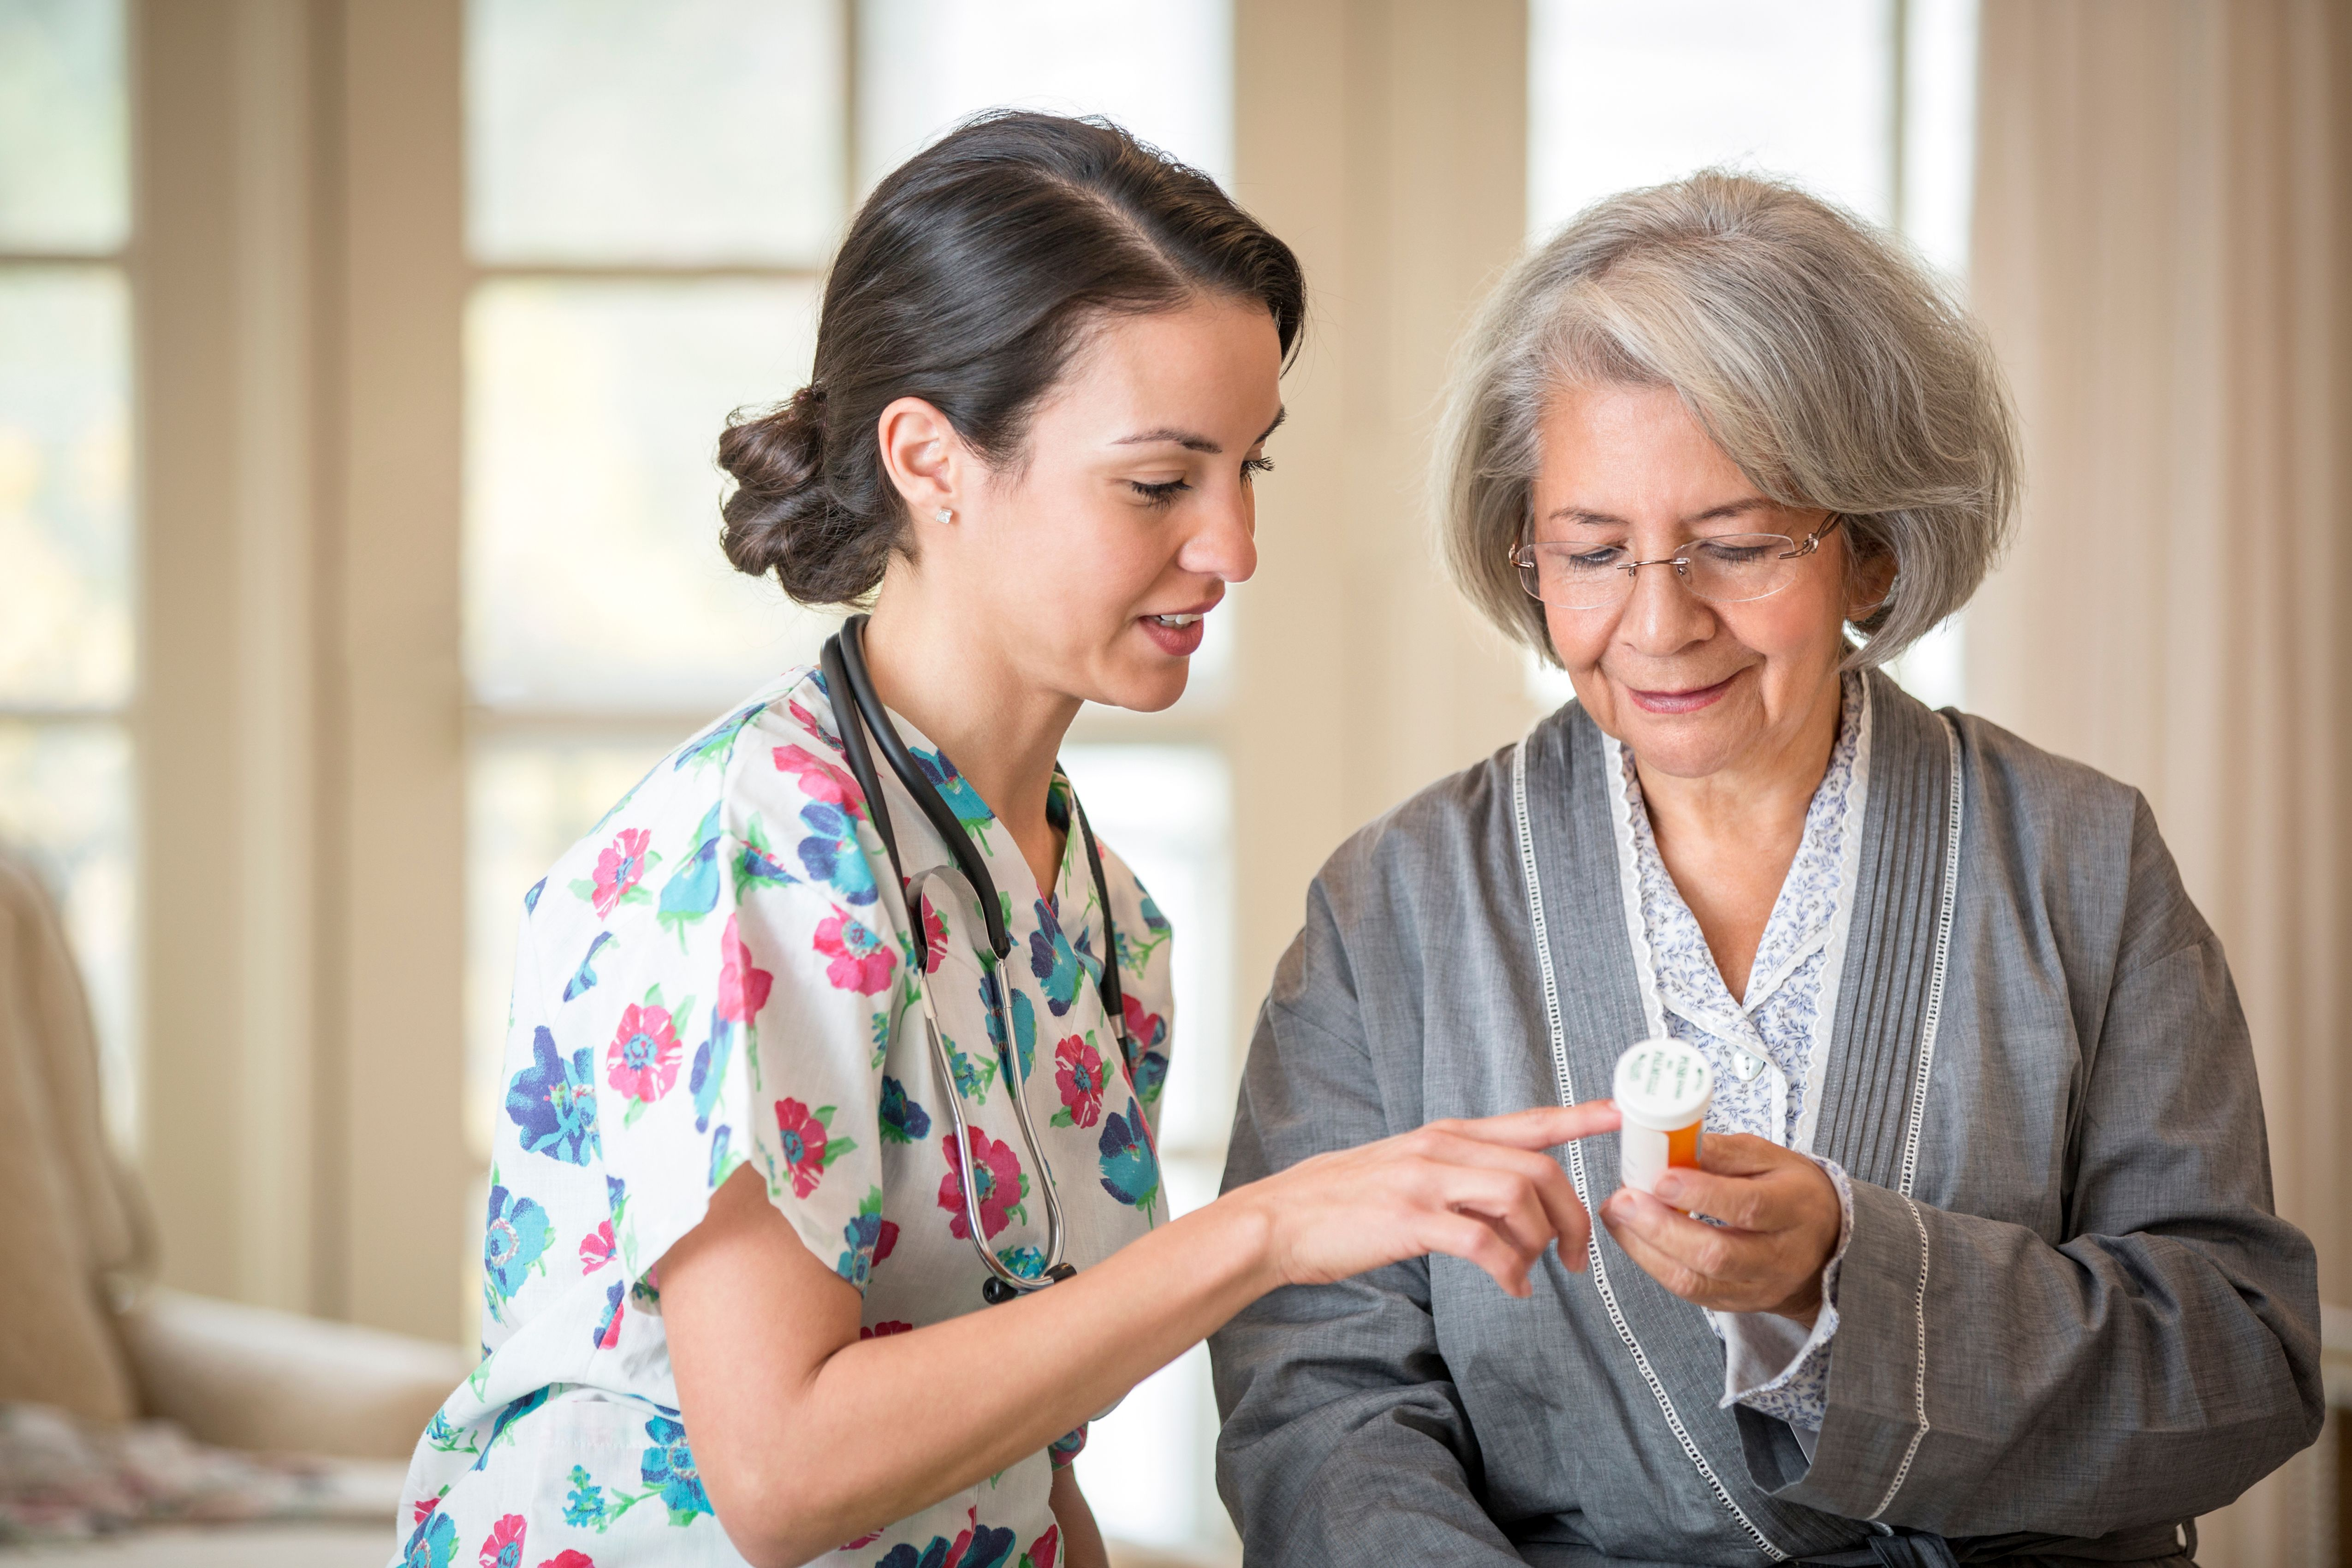 Nurse explaining medication to patient